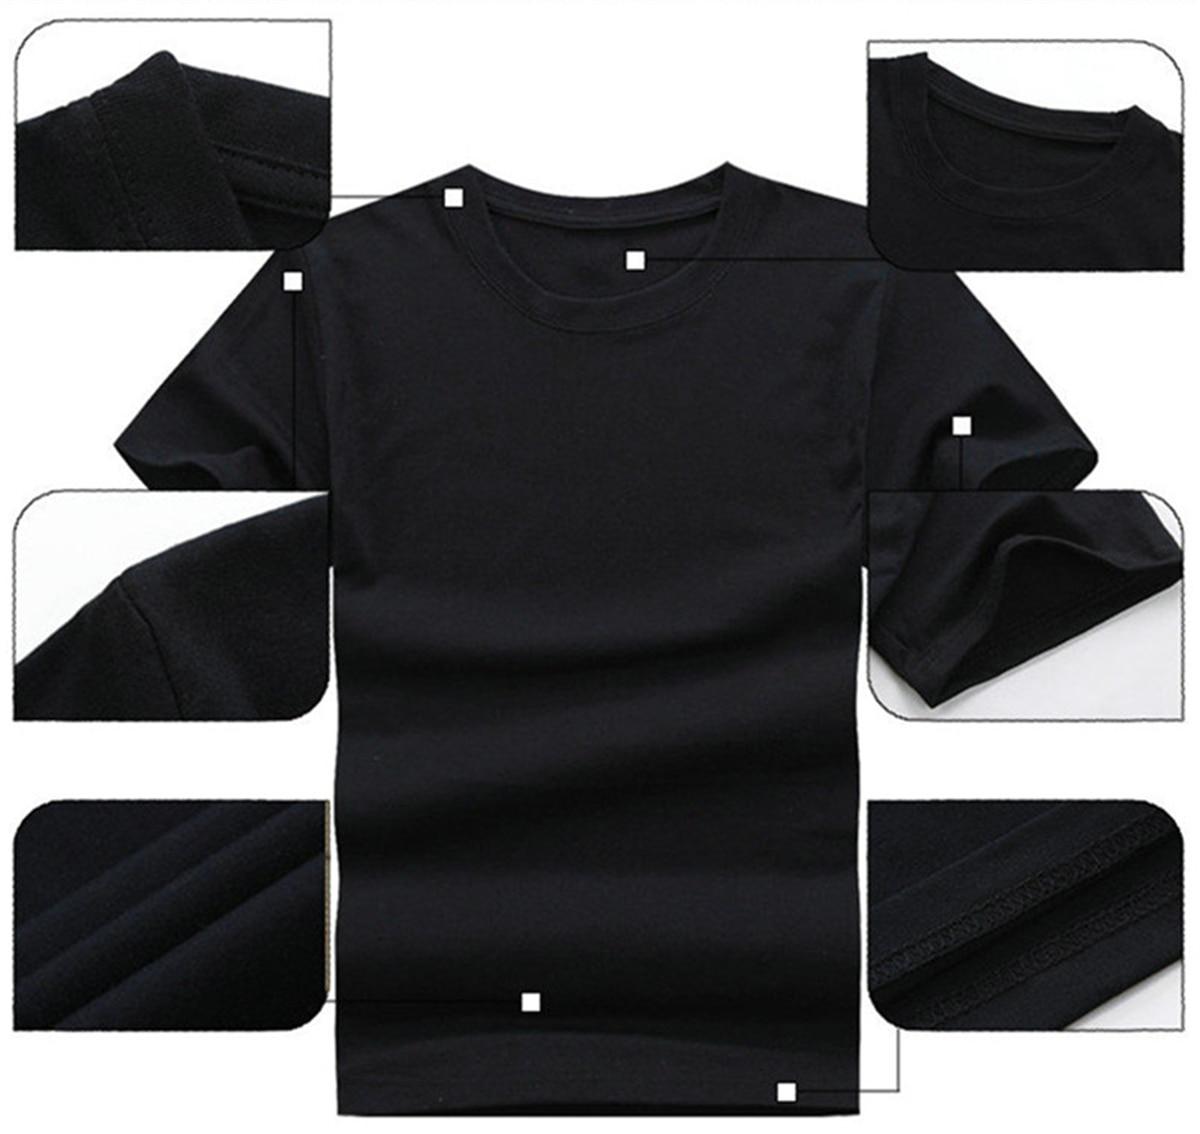 GILDAN Skaters Gonna Skate-Cute Roller Derby Roller Skating T-Shirt sunglasses women T-shirt